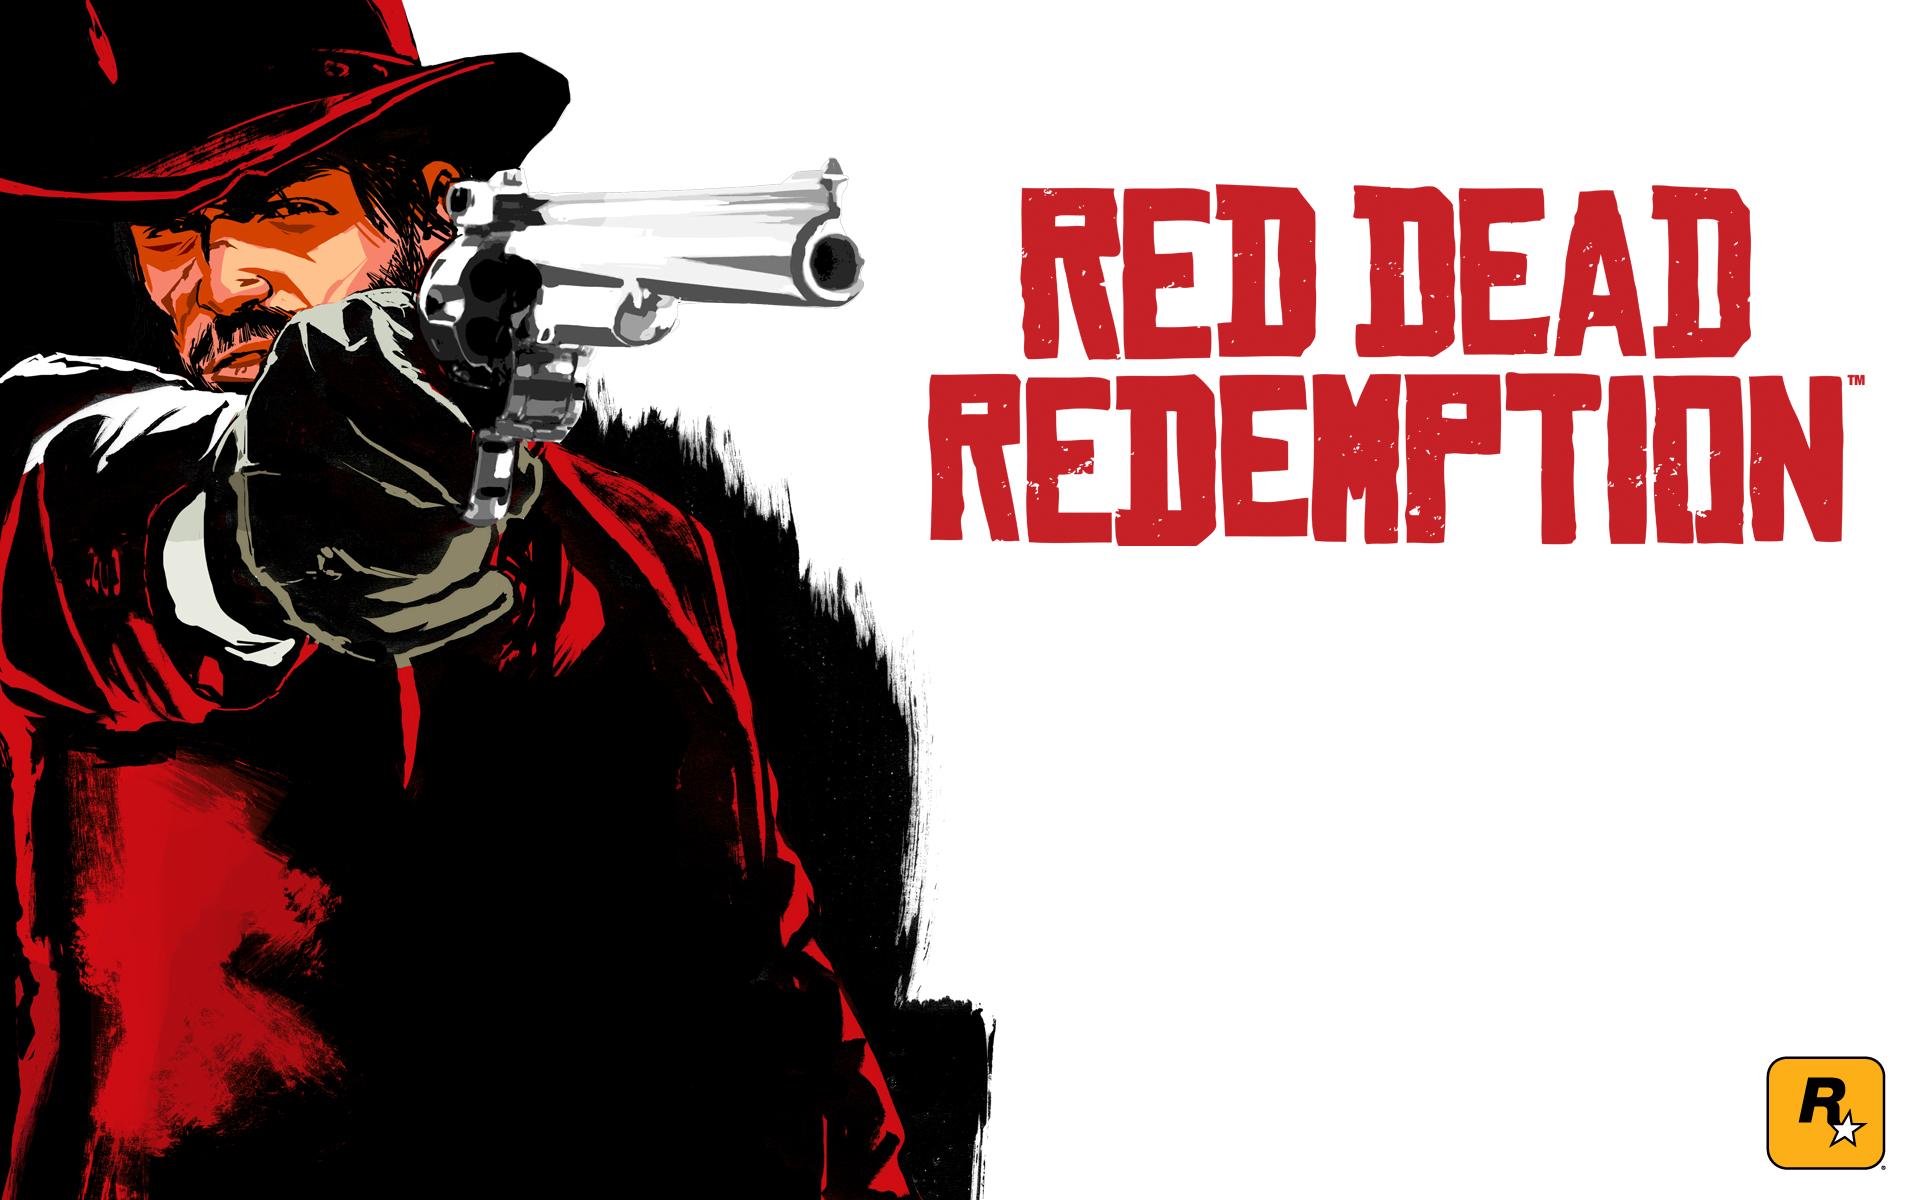 red dead redemption wallpaper 34876